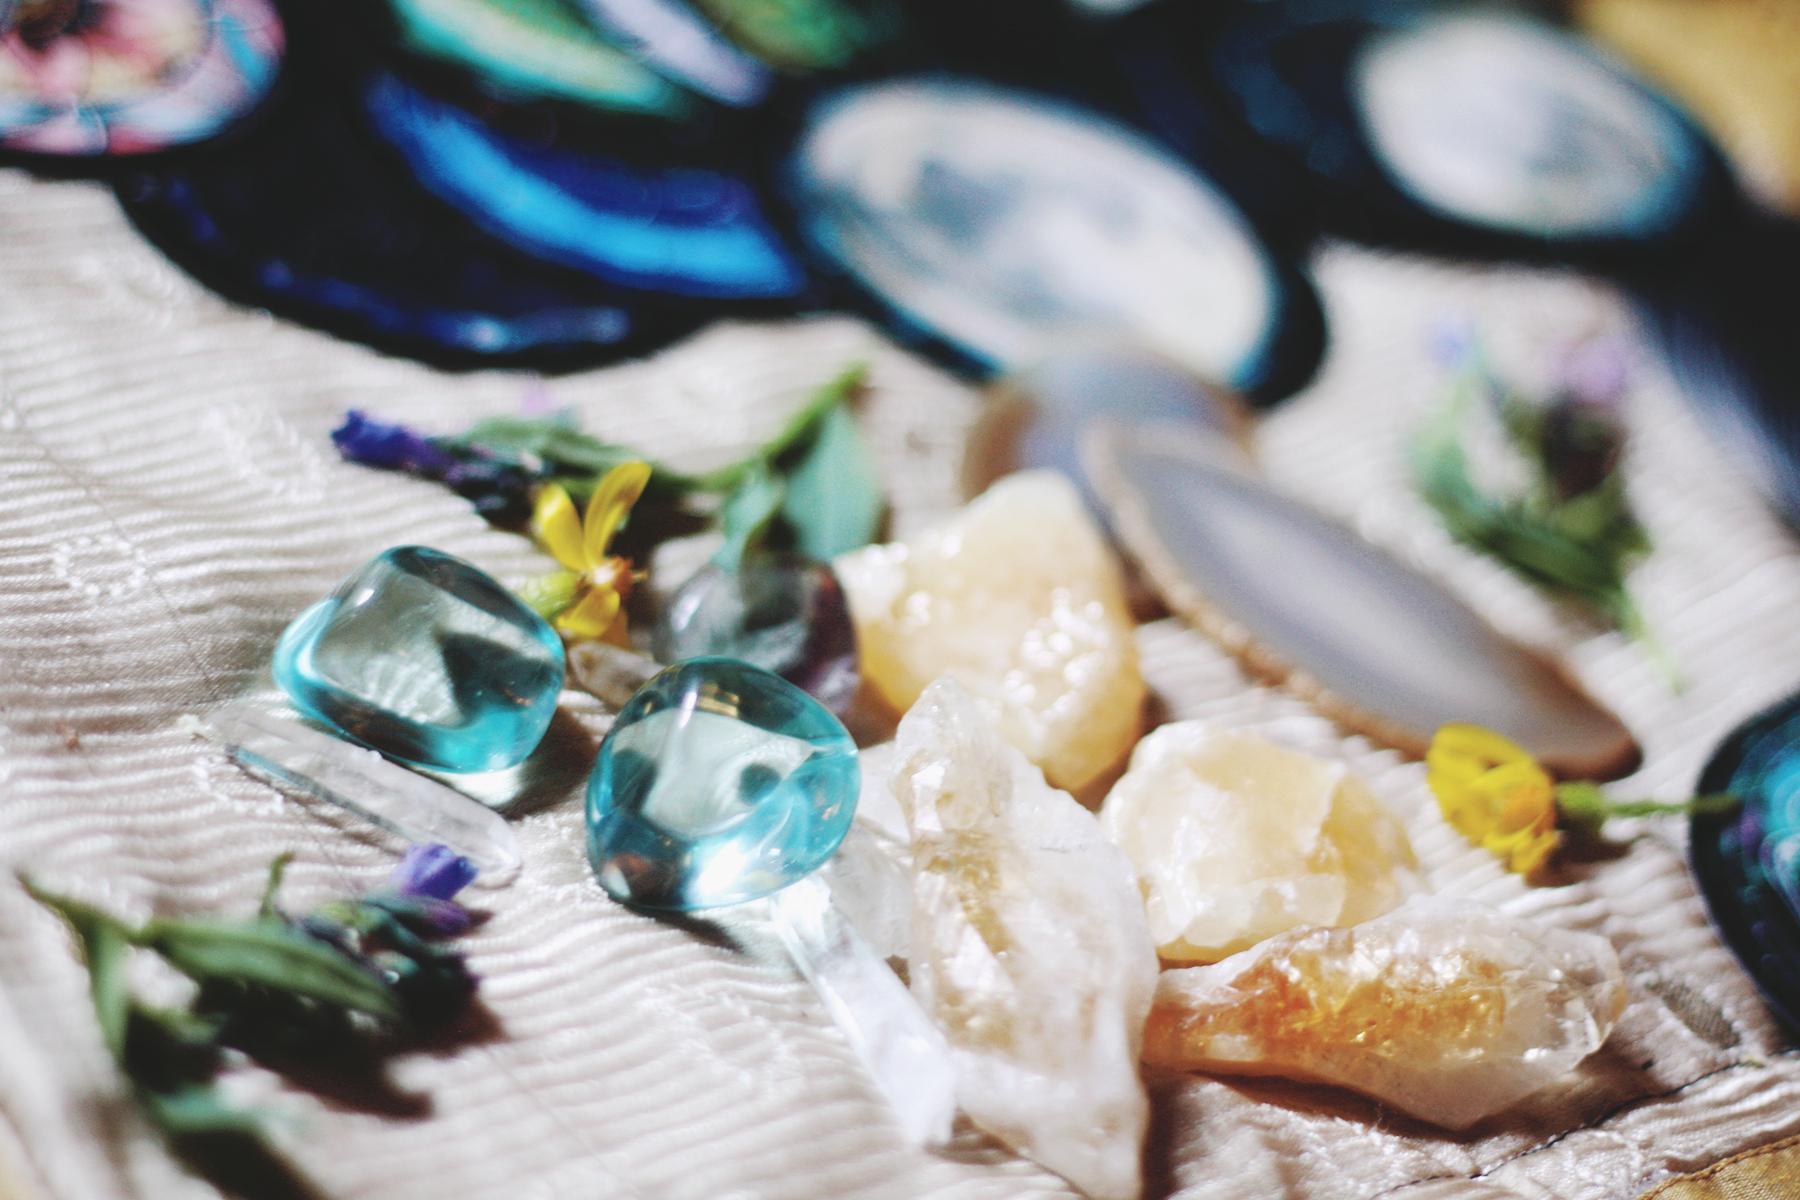 Crystal Companions for Spirit de la Lune